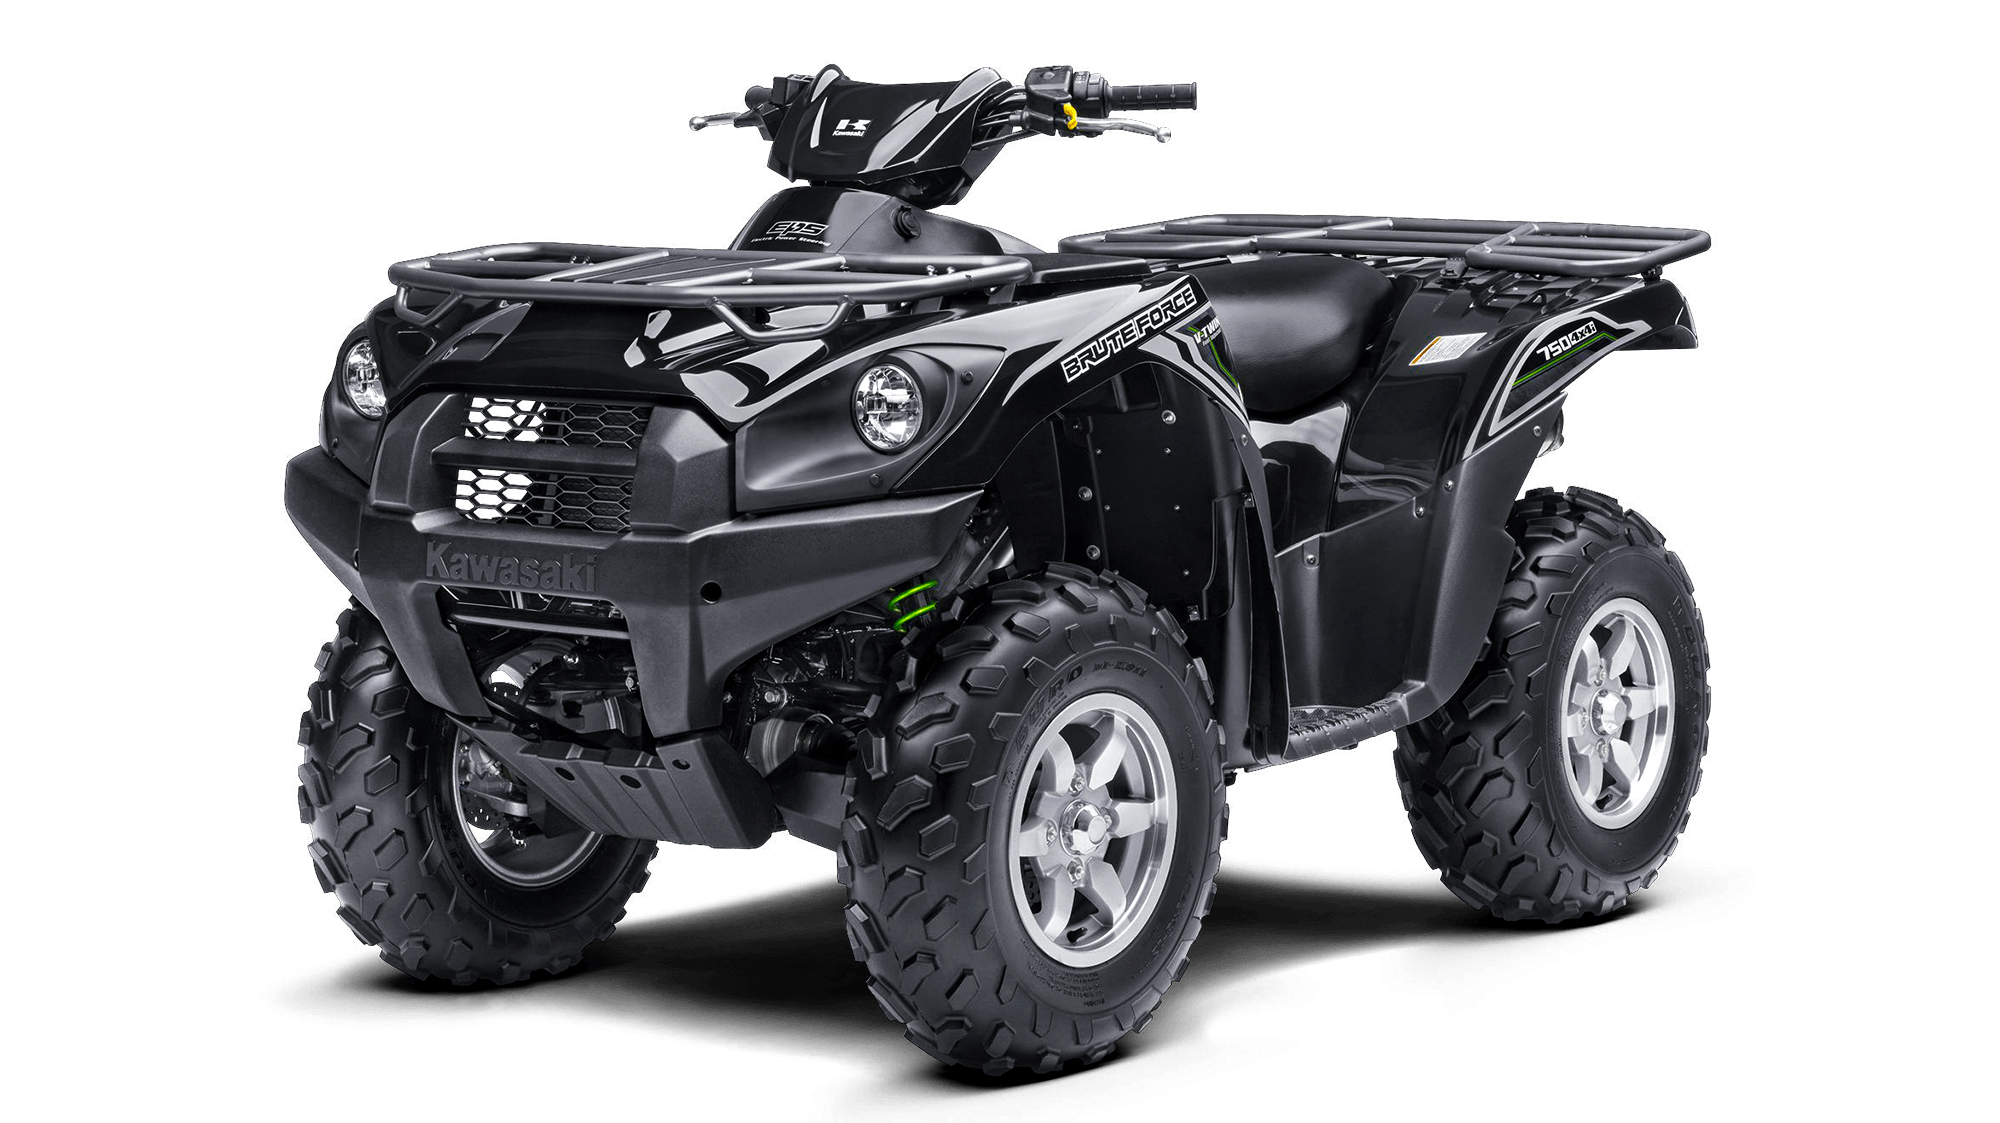 2015 Brute Force 750 4x4i Eps Sport Utility Atv By Kawasaki 2006 Yamaha Rhino 450 Rear Brake Diagram On Piston Caliper Atvs Brochures